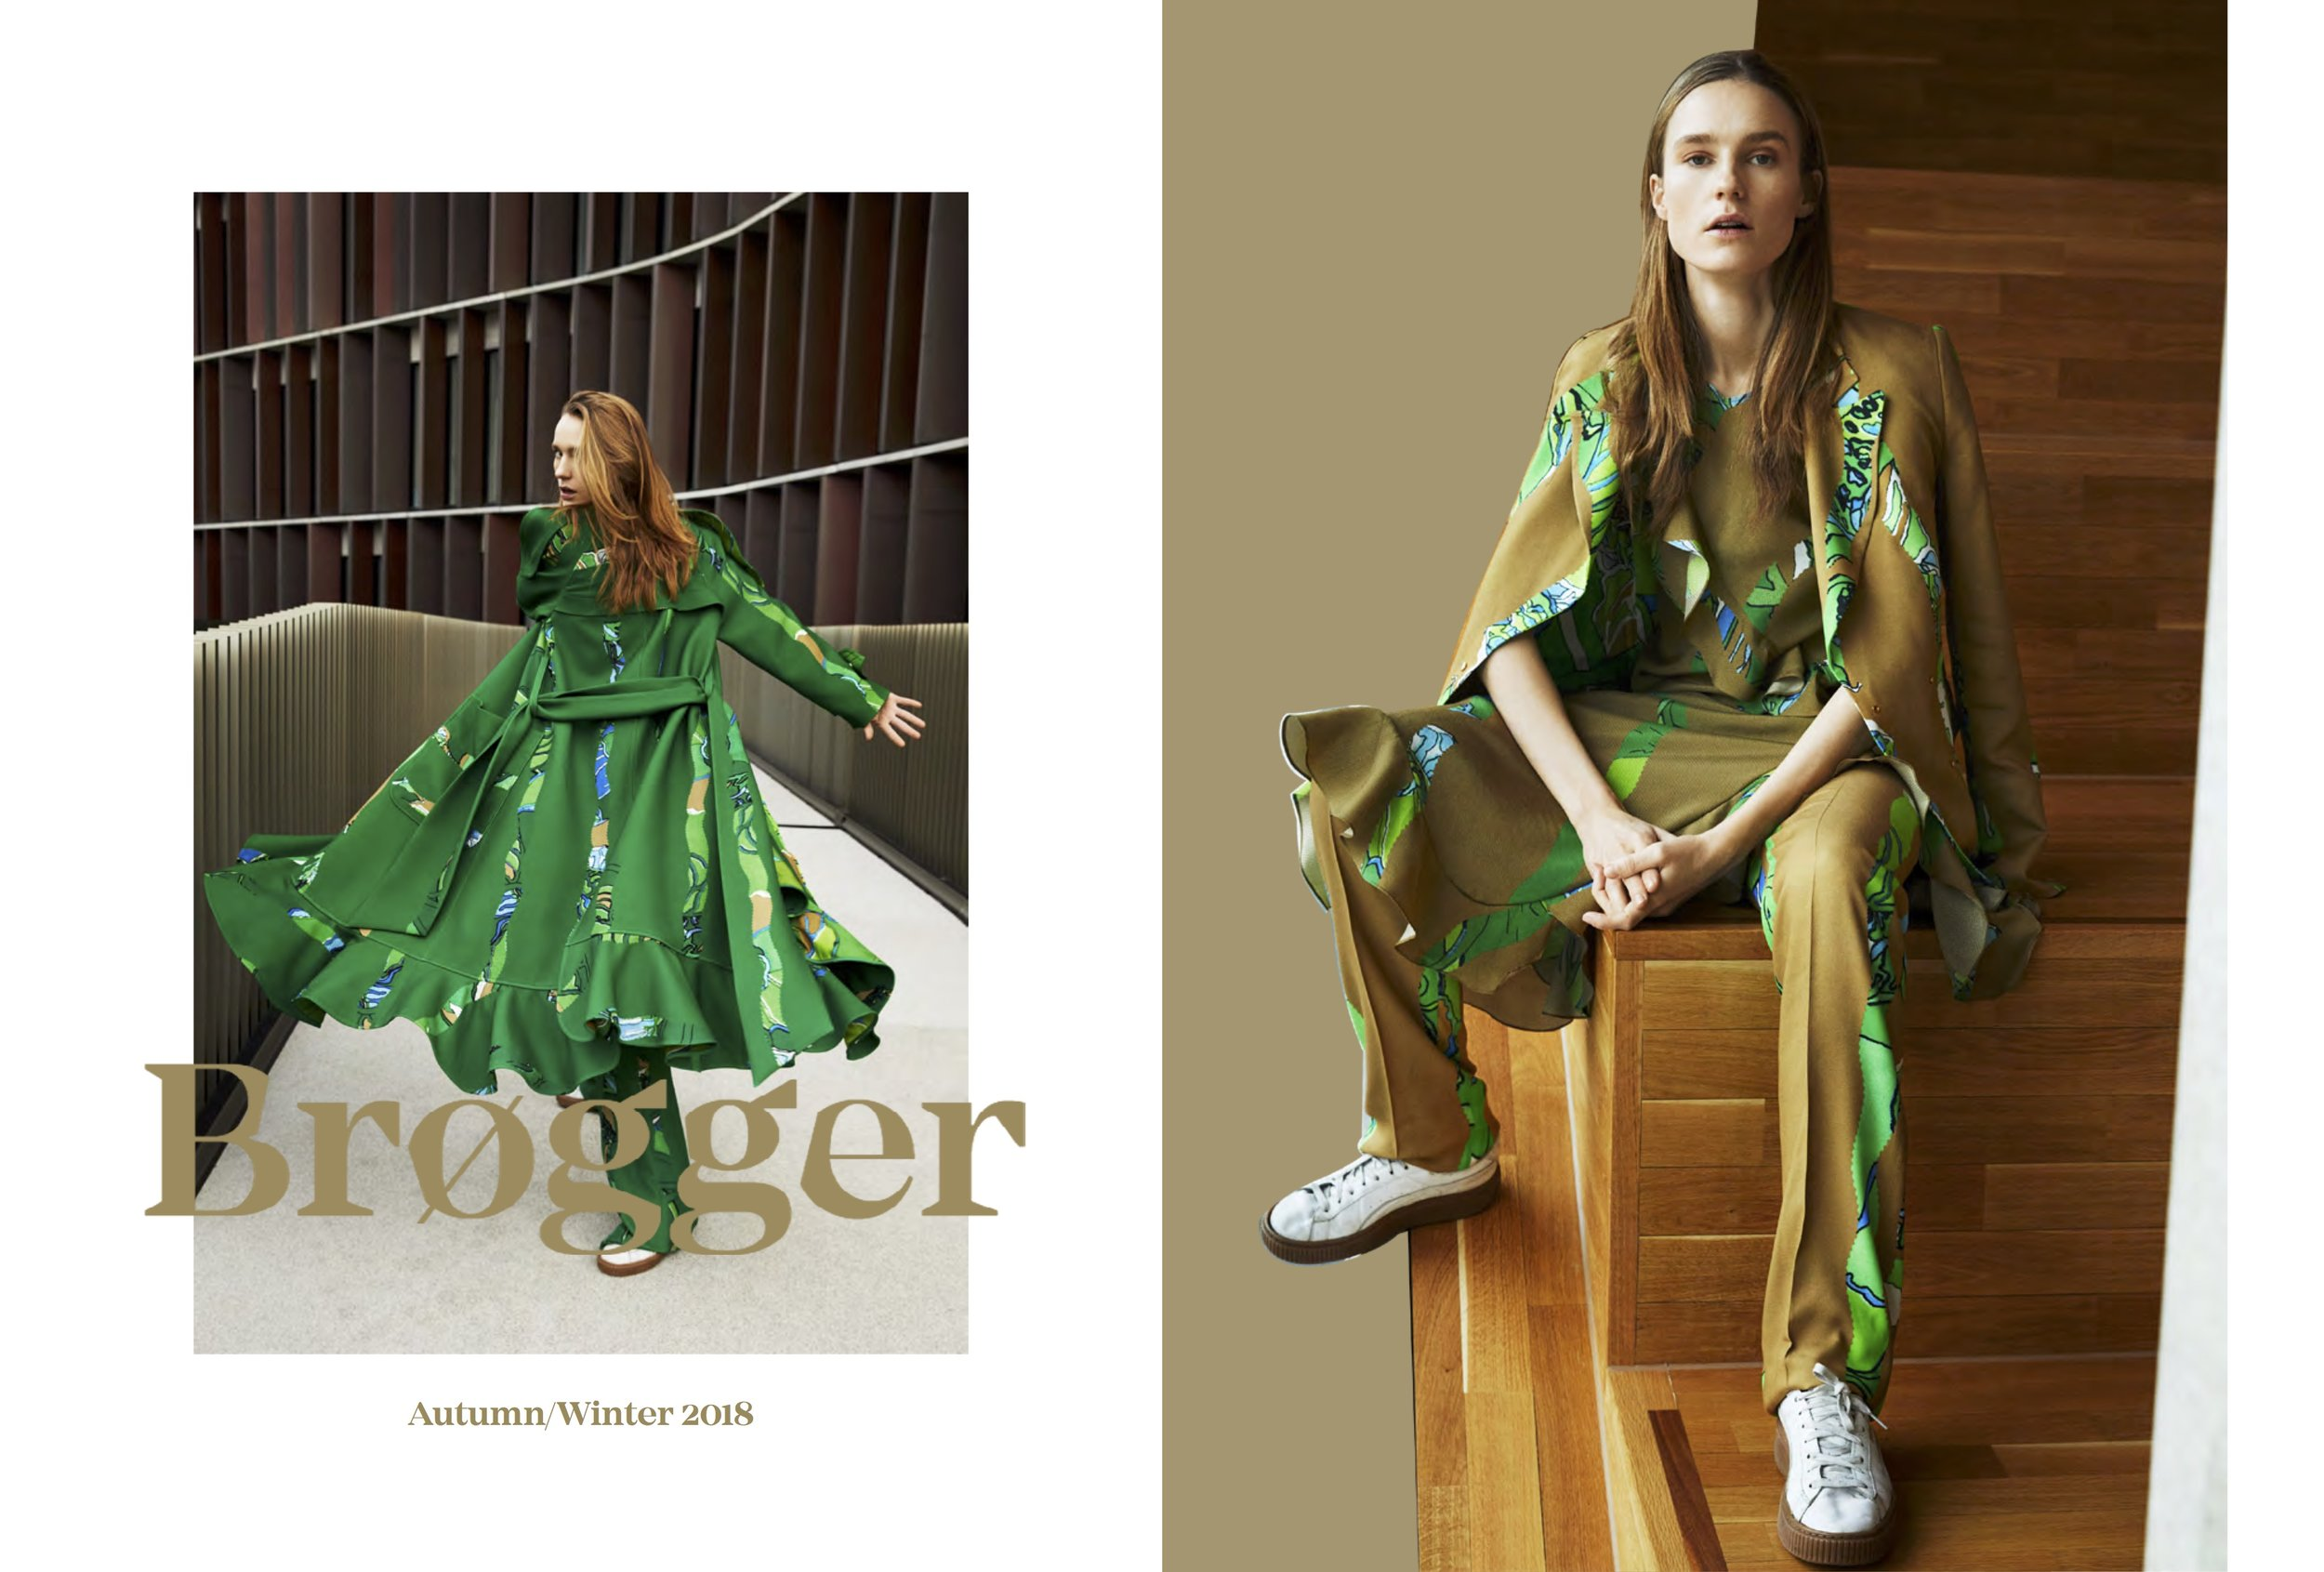 Brøgger_lookbook_AW18_digital1.jpg